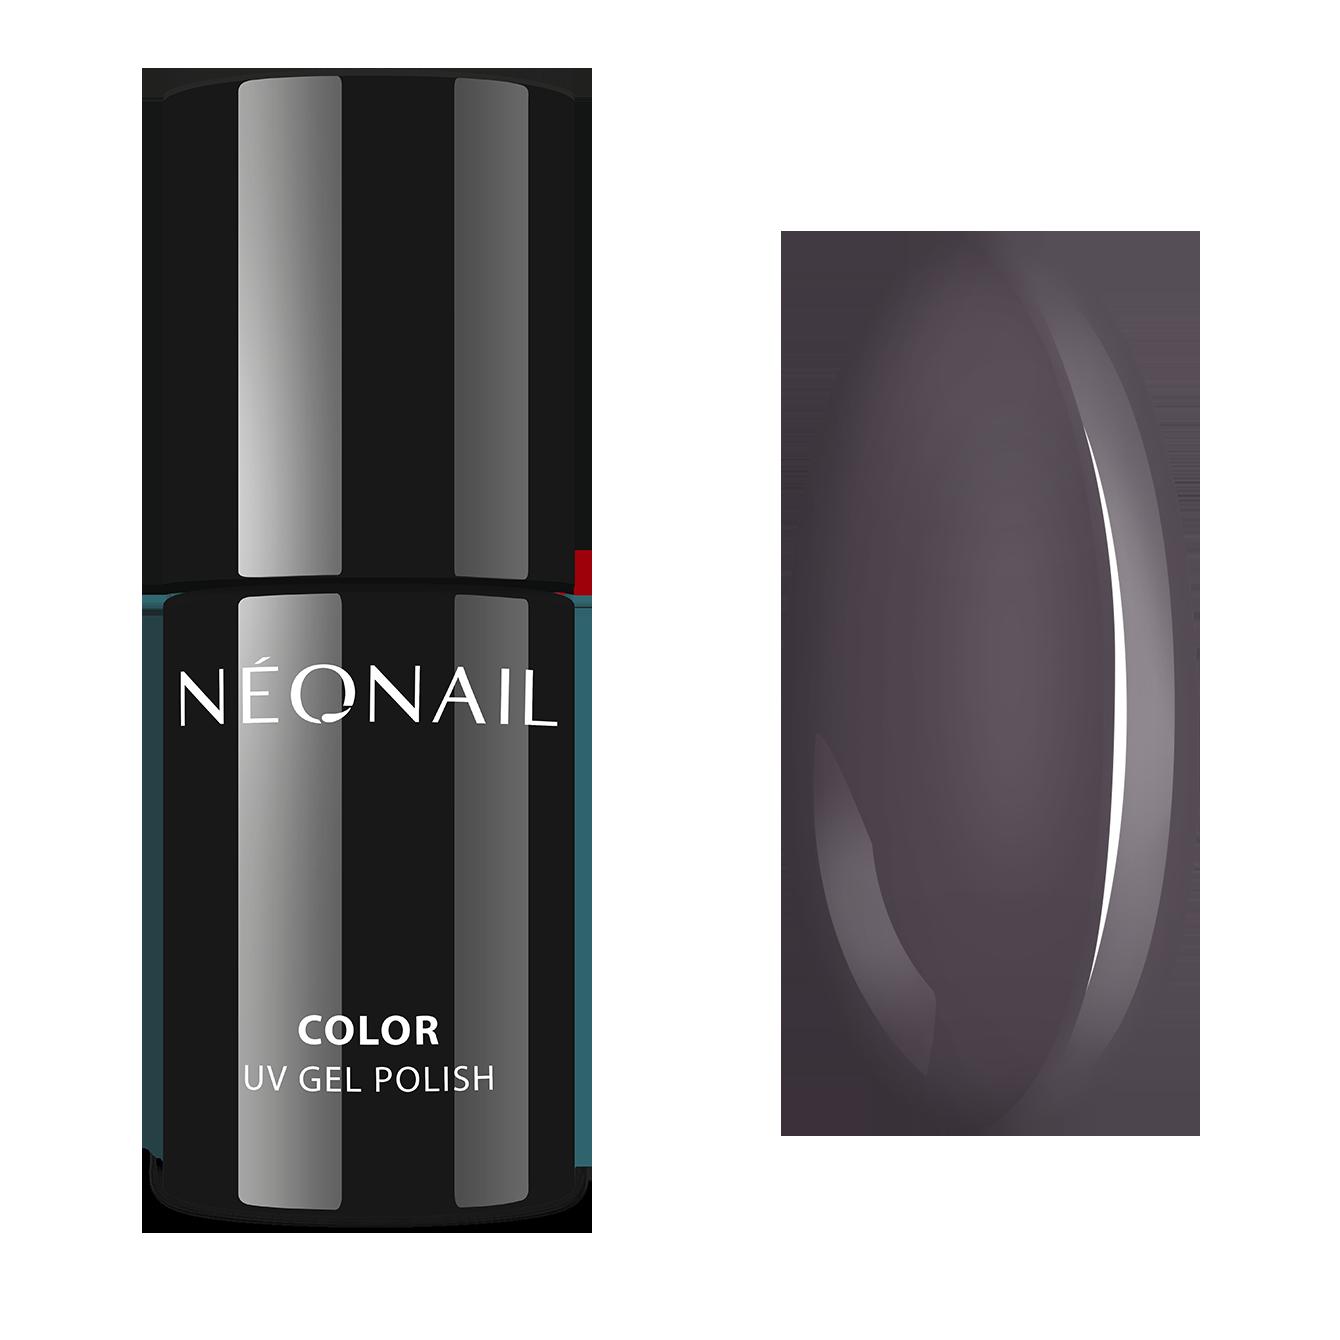 NeoNail Be Helpful